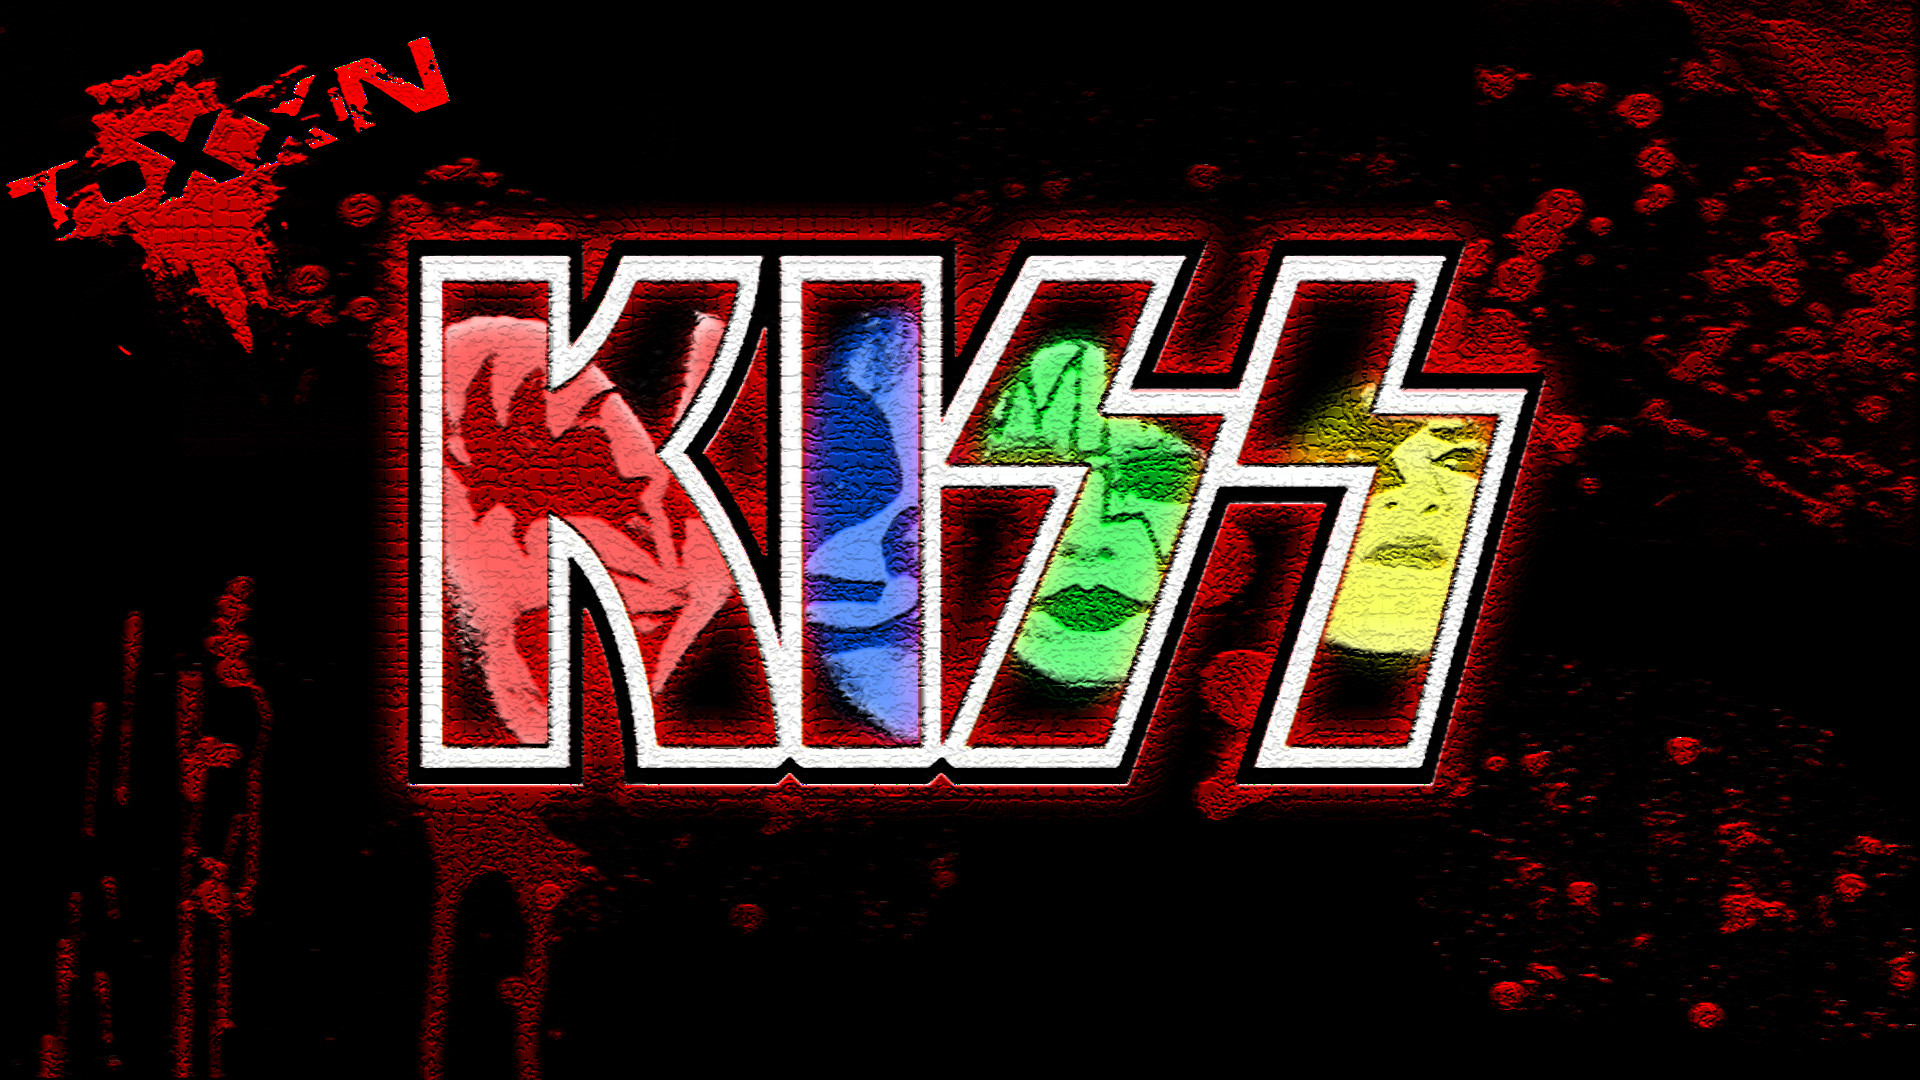 KISS Wallpaper https://freewallpaperspot.com/wallpapers/kiss-wallpaper-